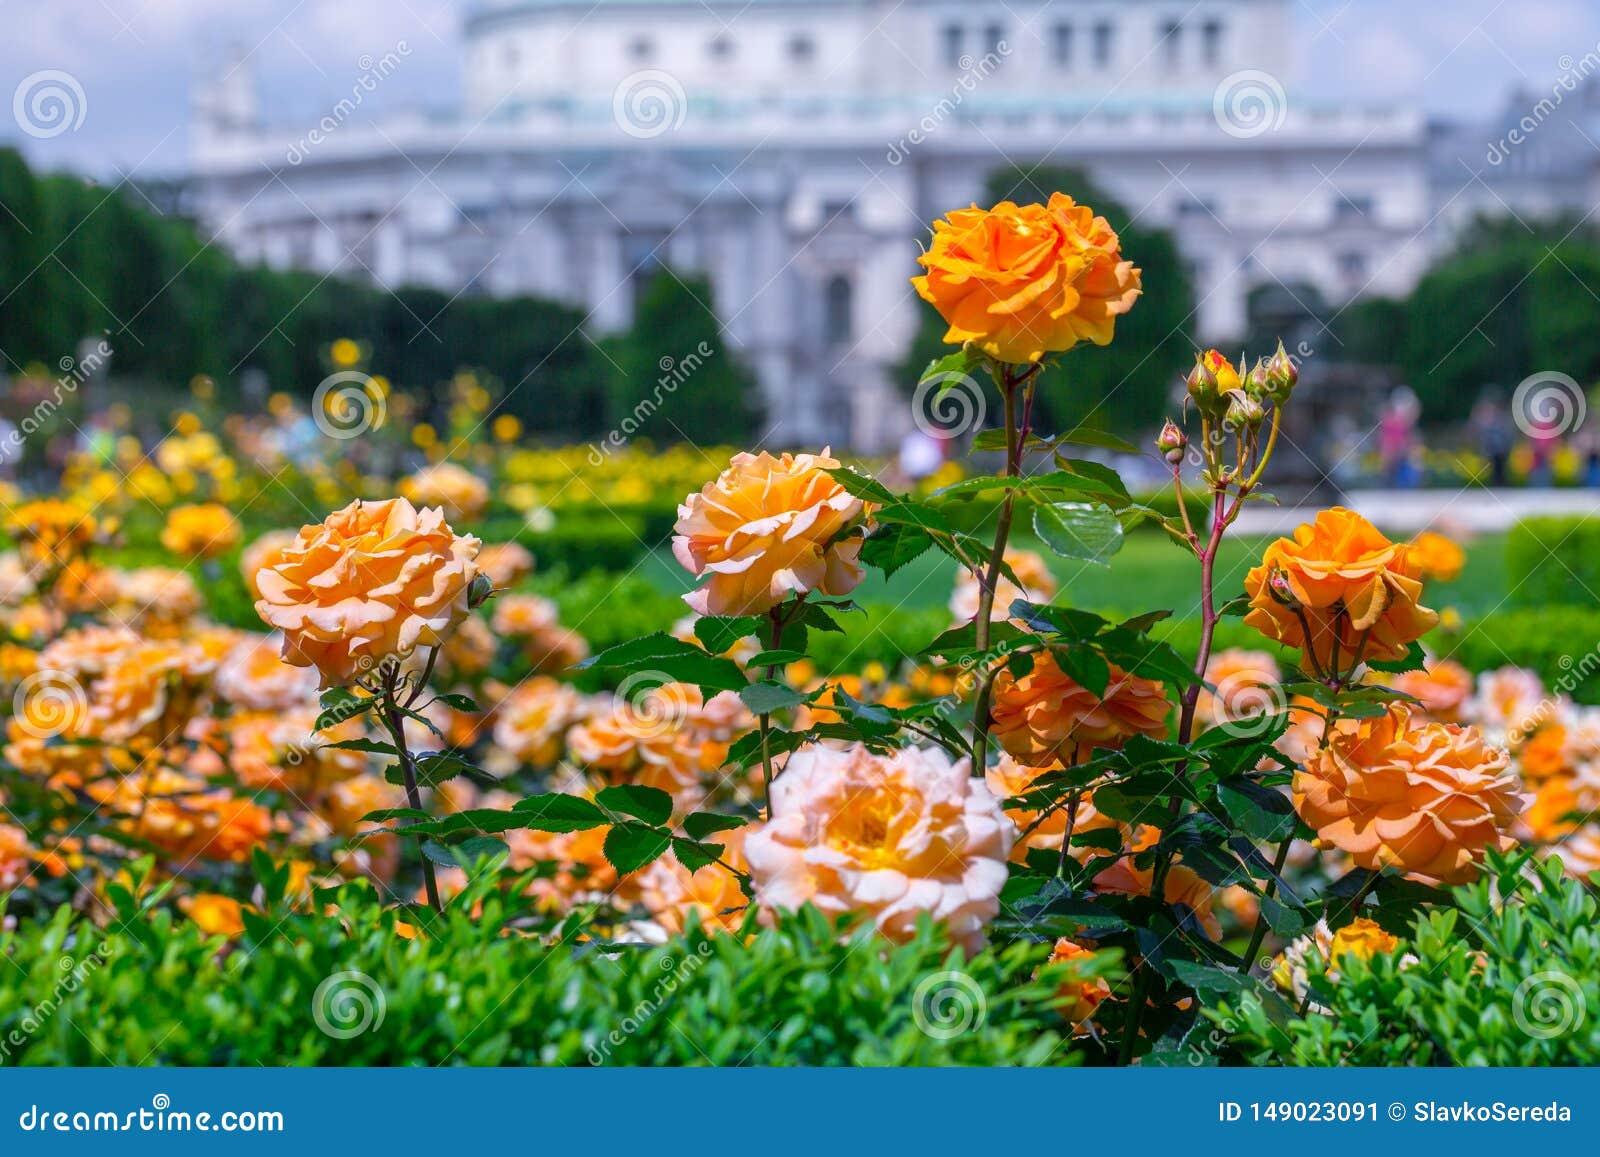 Frodiga blommande orange rosor i rosa tr?dg?rd Volksgarten( people' s park) i Wien ?sterrike